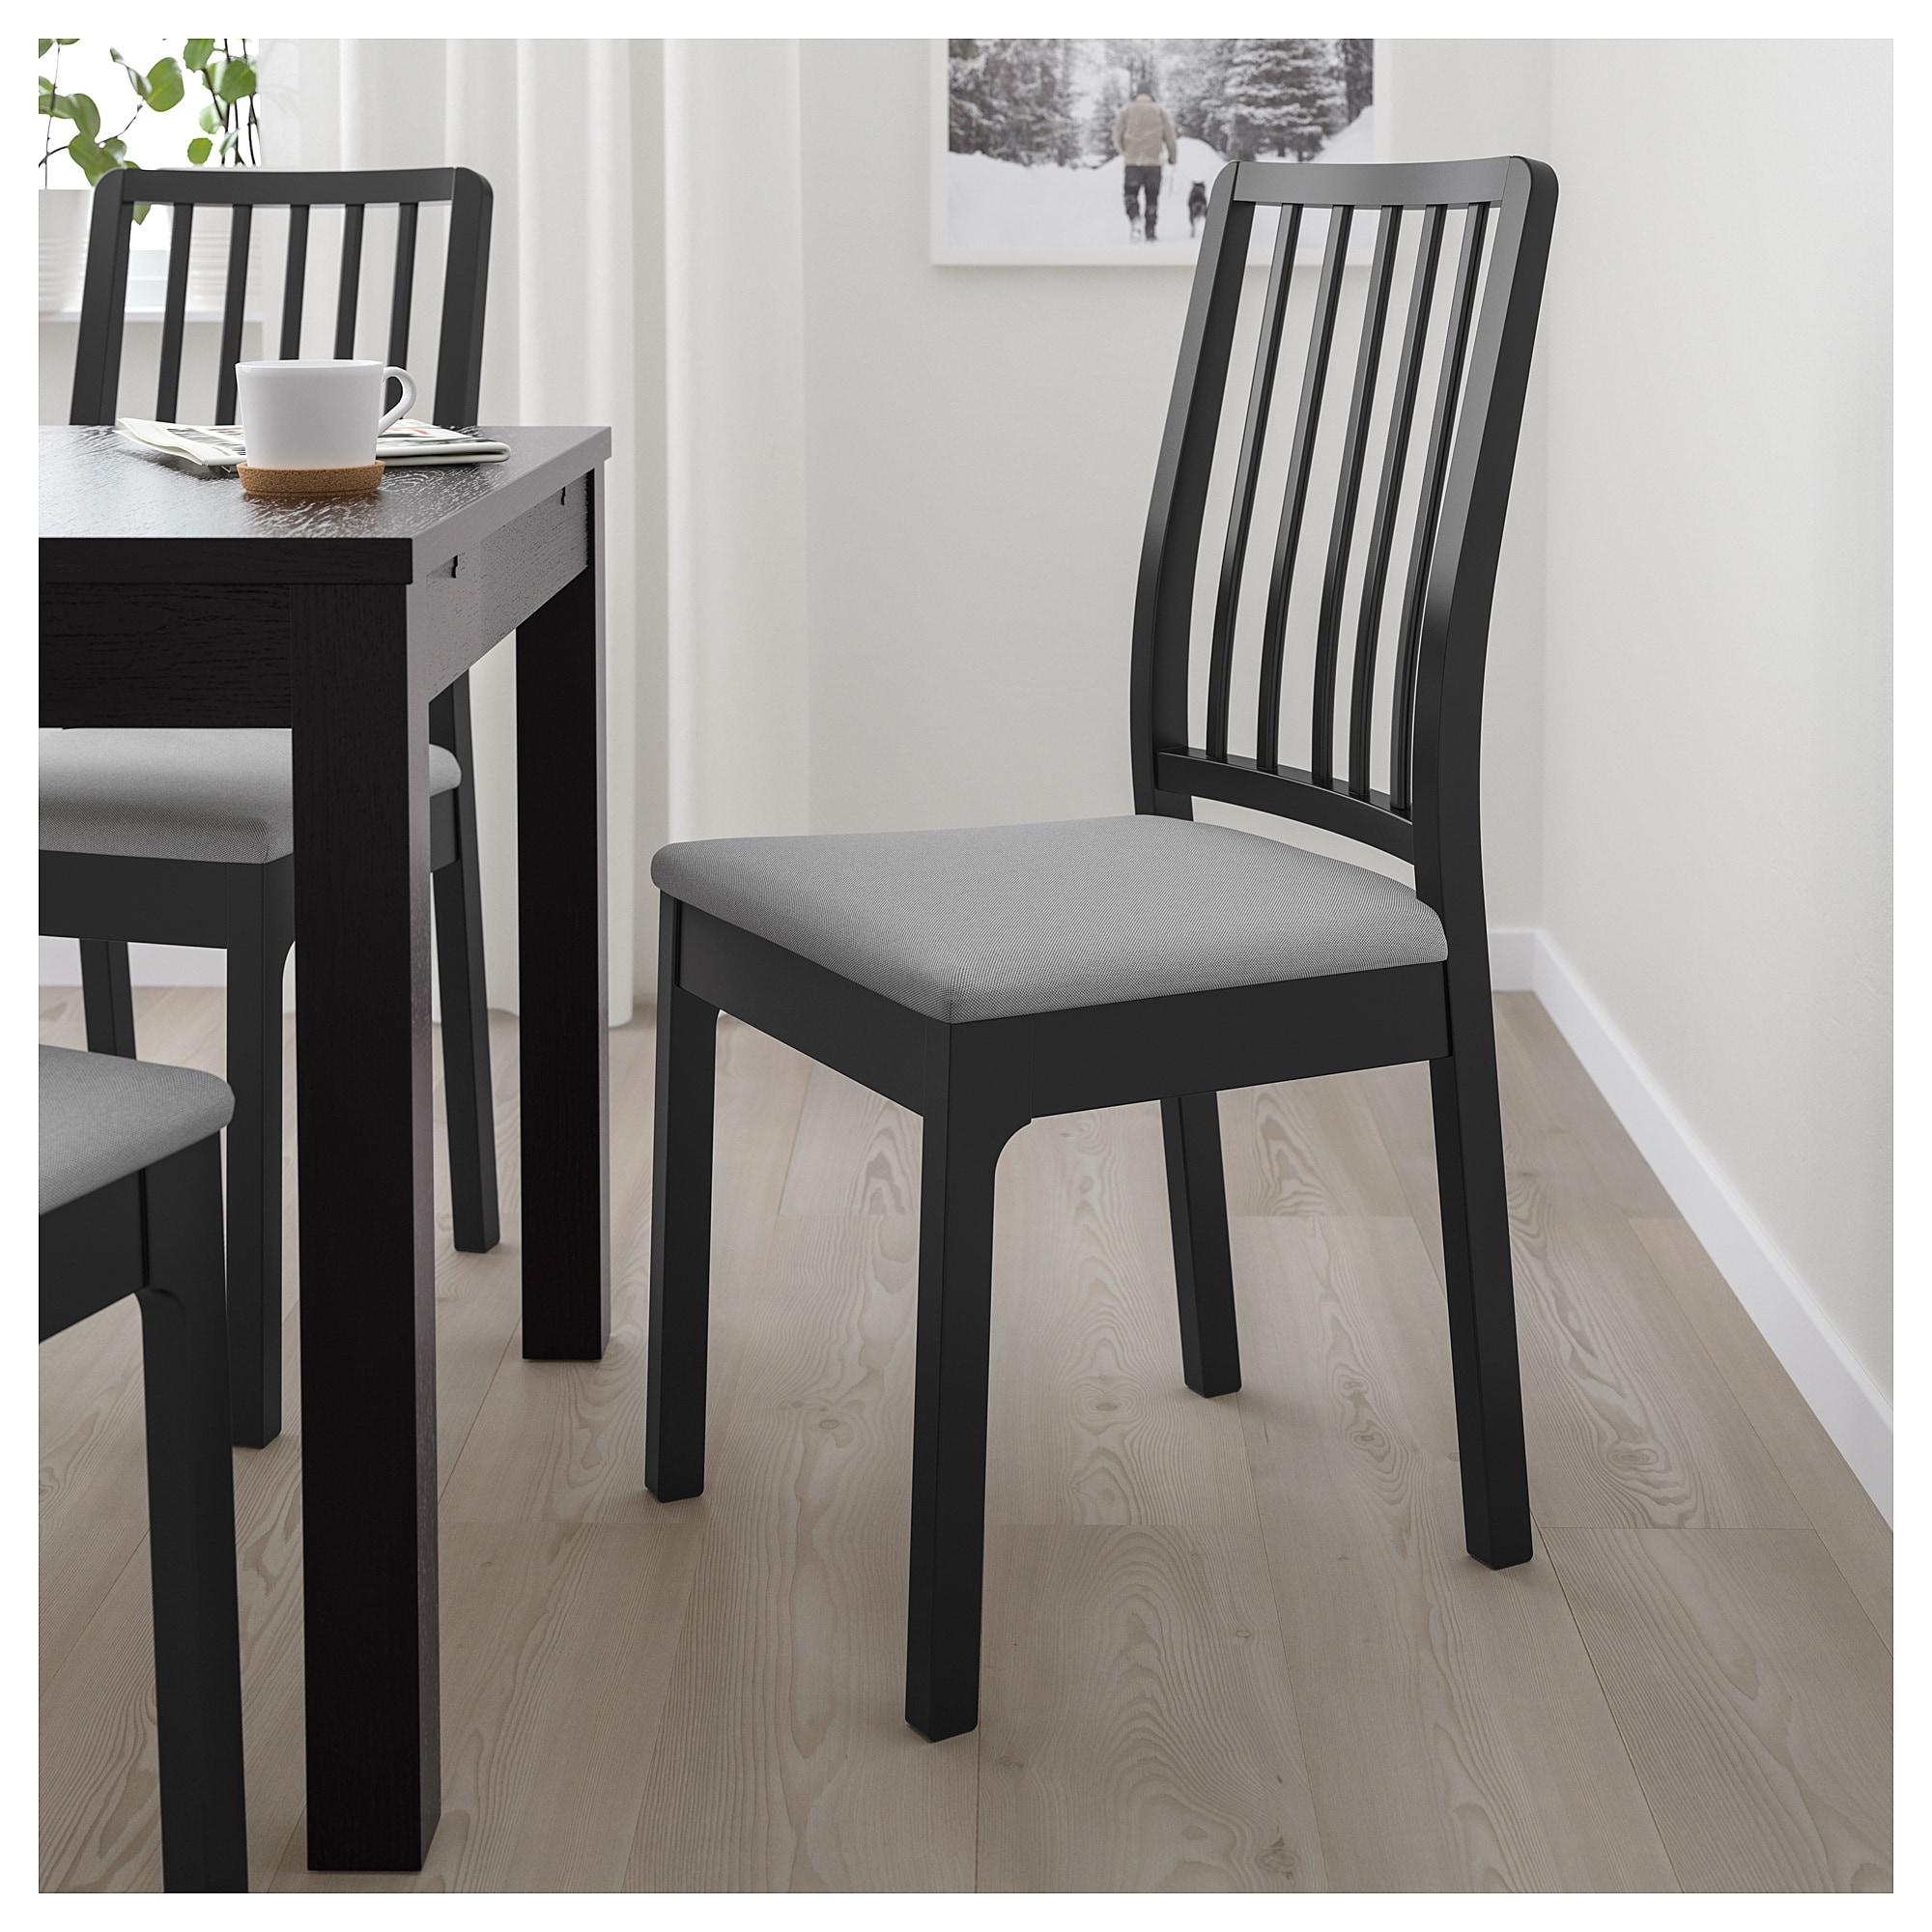 Ikea Eetkamer Stoelhoezen.Furniture And Home Furnishings Ikea En Gray